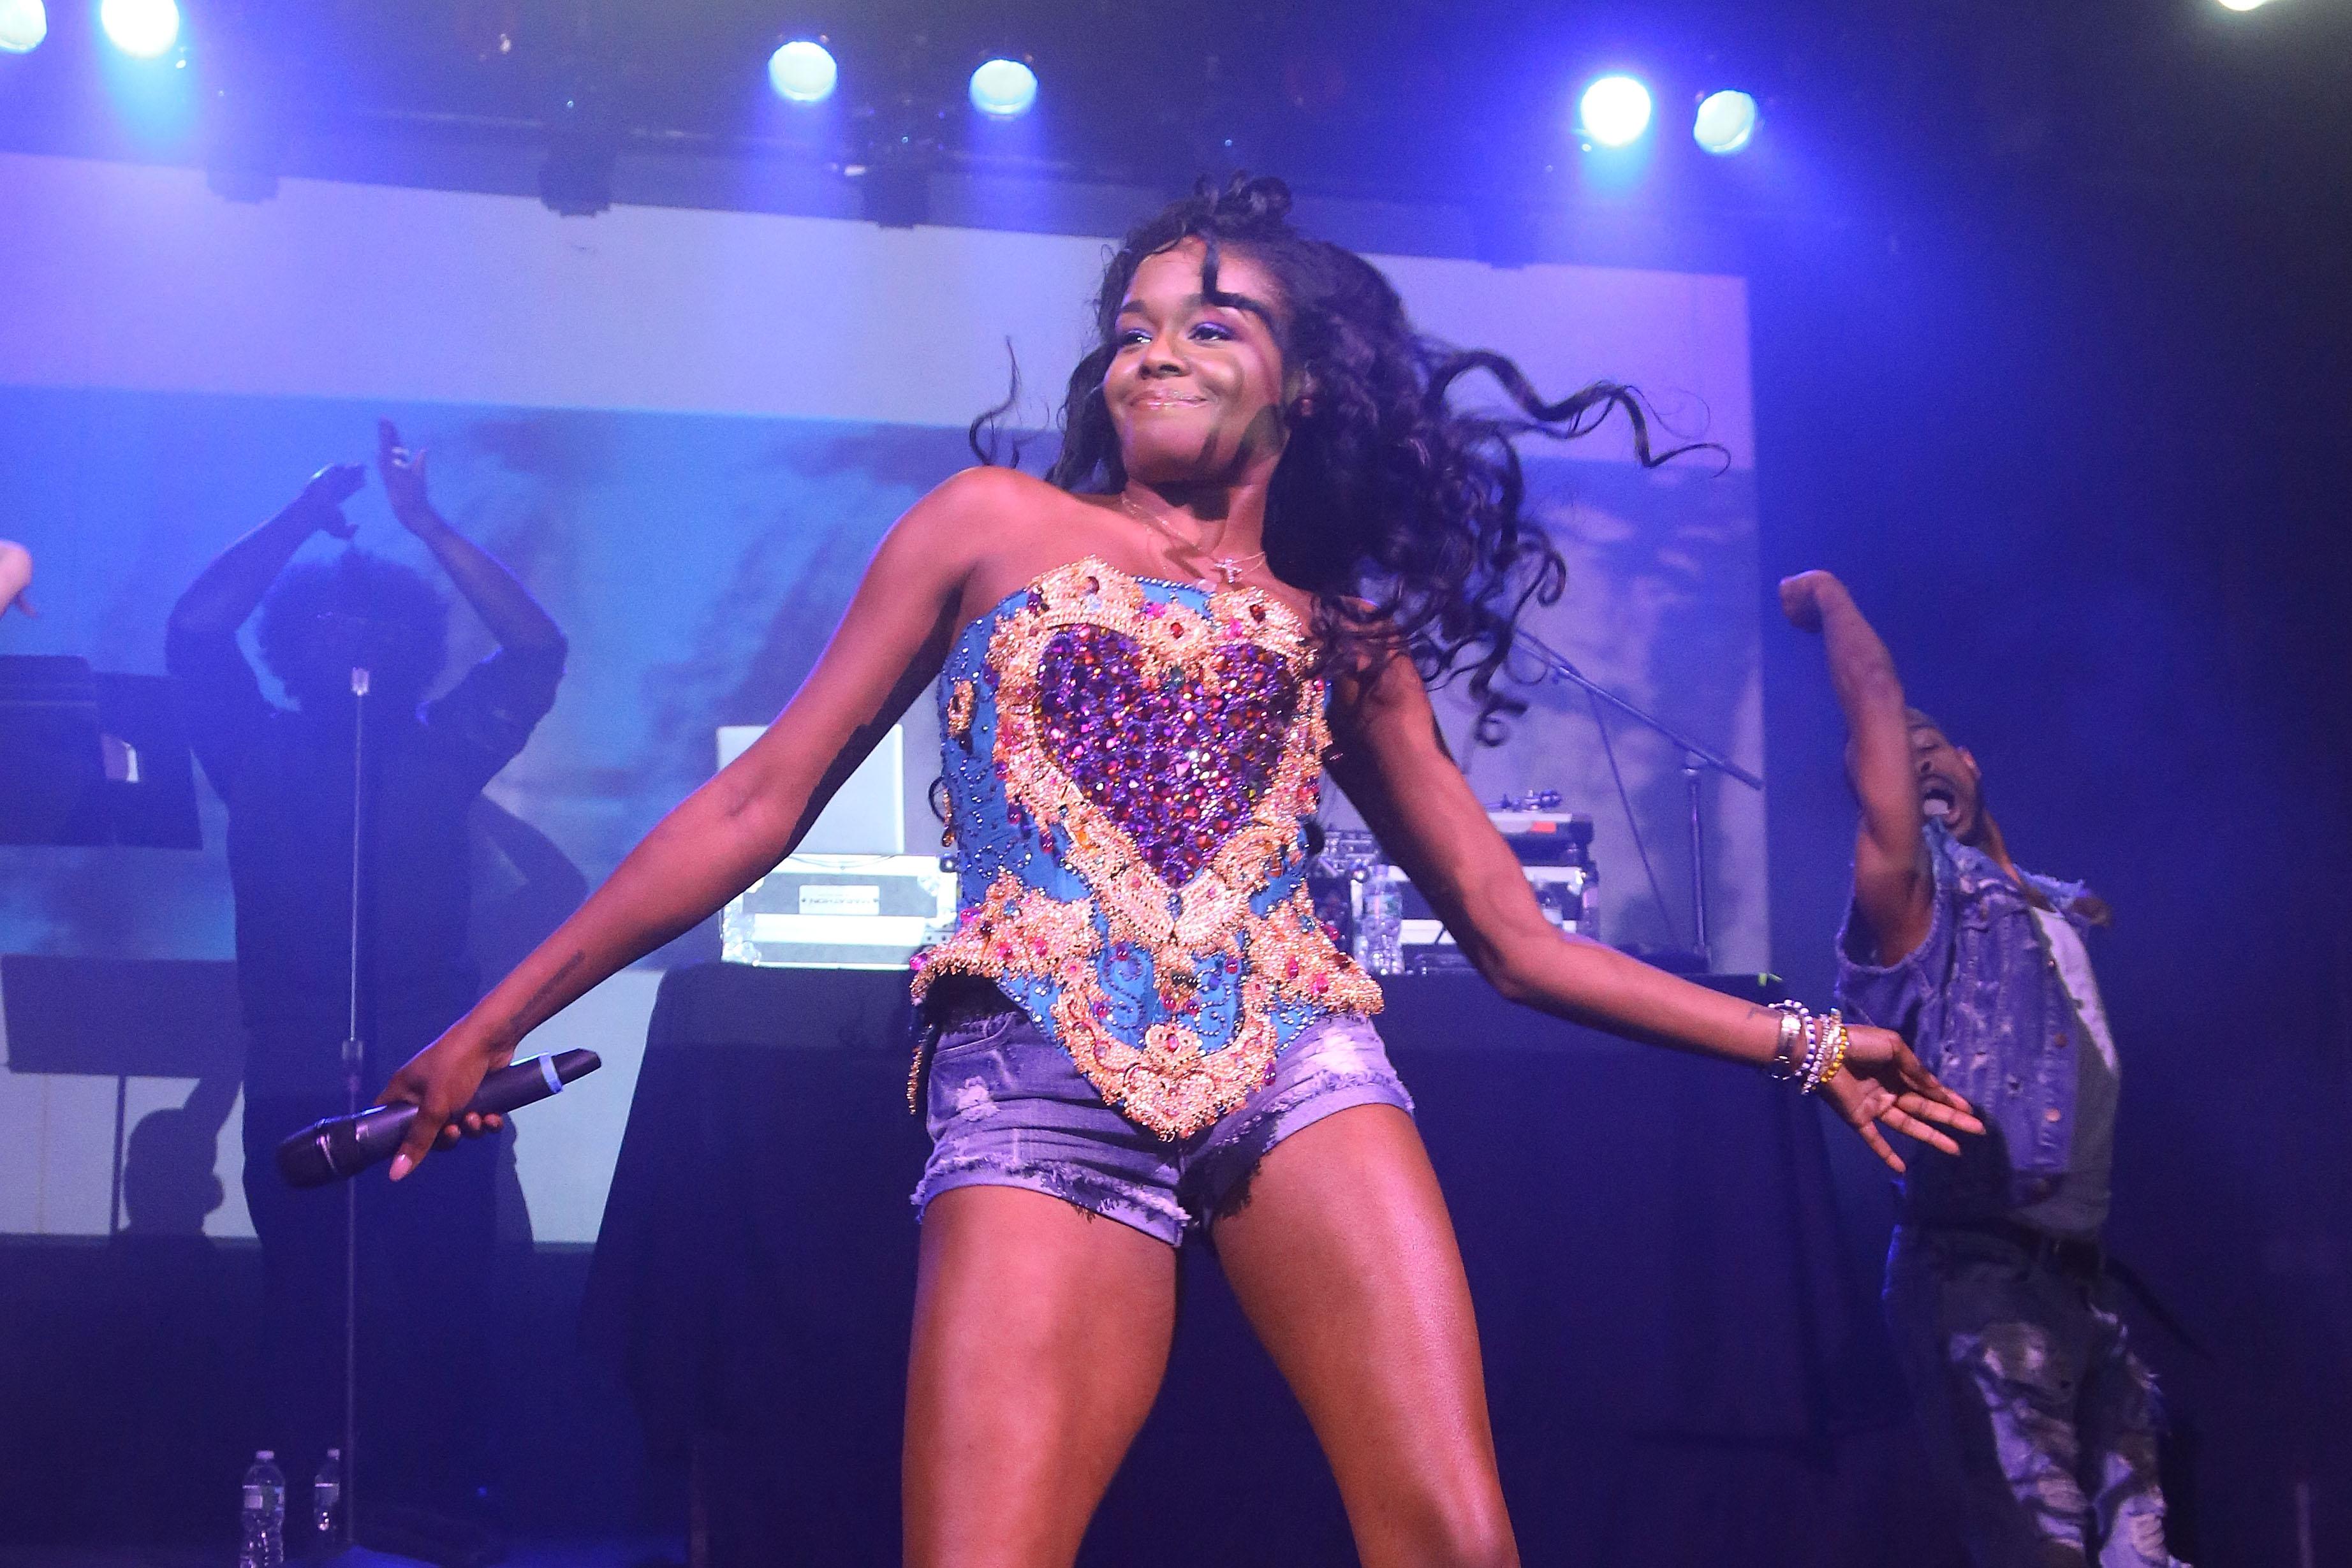 NEW YORK, NY - MAY 11:  Azealia Banks performs at Irving Plaza on May 11, 2015 in New York City.